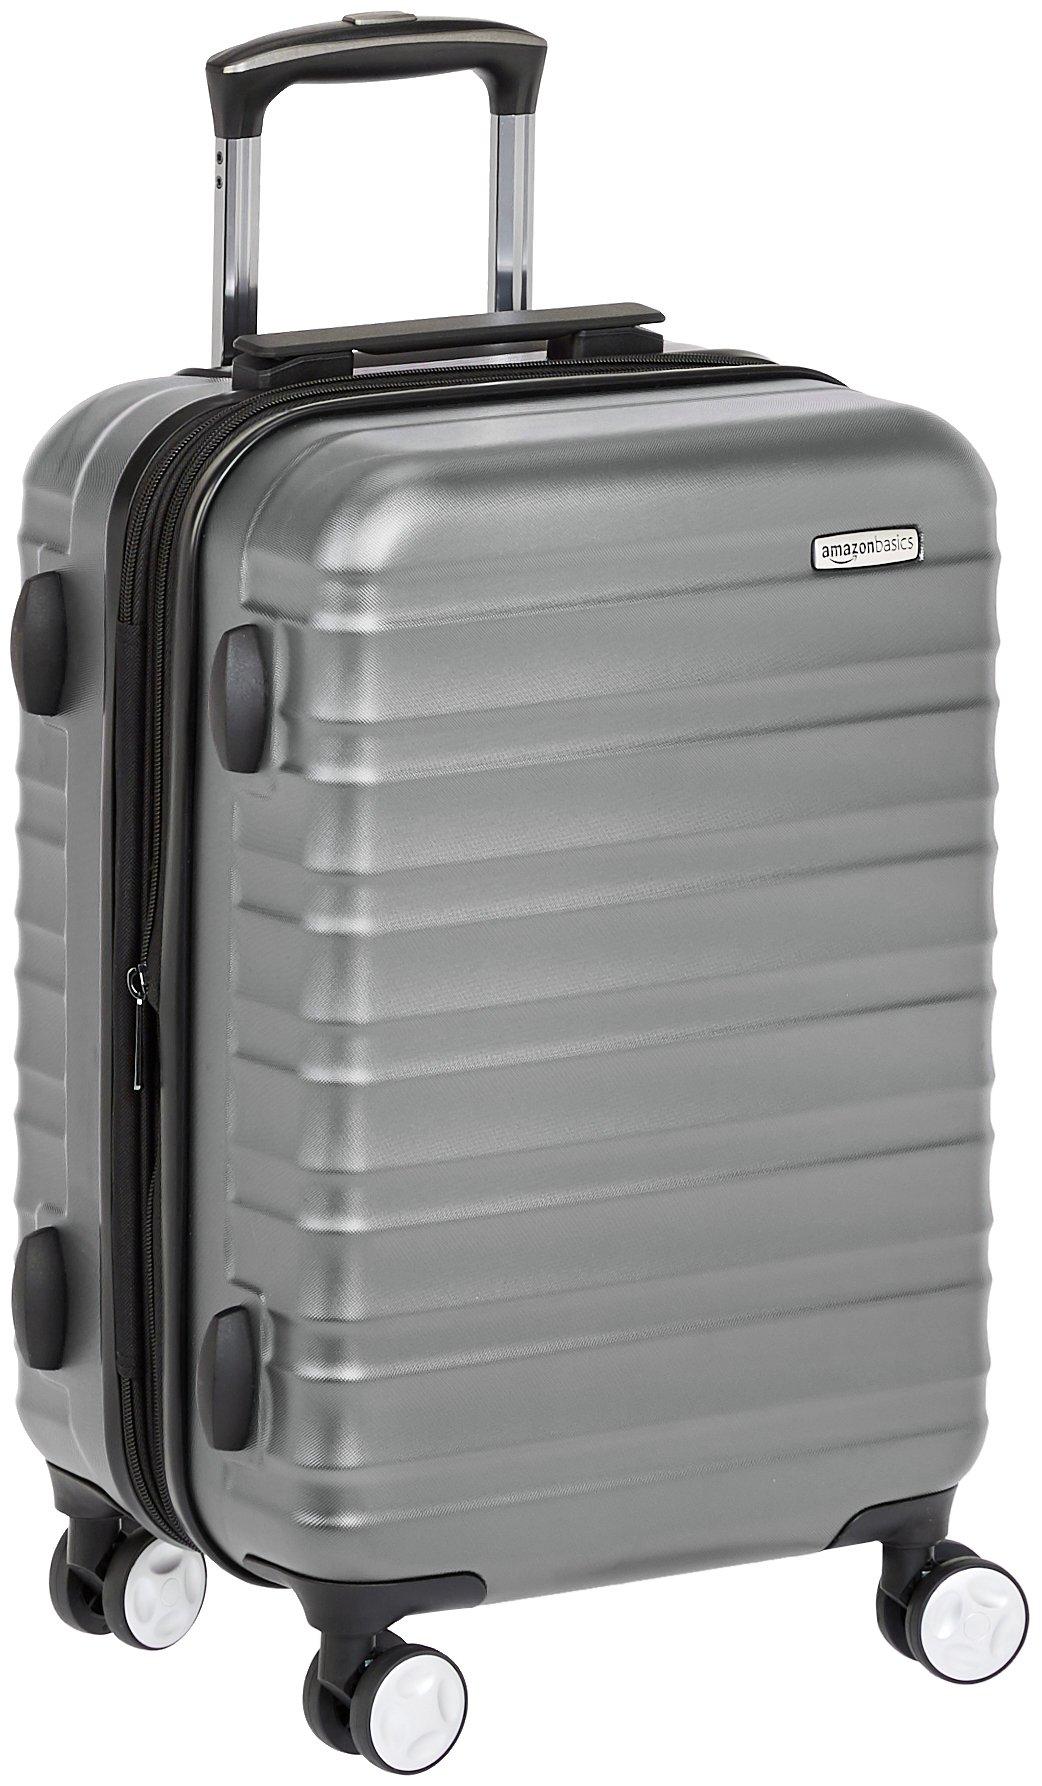 AmazonBasics Premium Hardside Spinner Luggage with Built-In TSA Lock - 20-Inch Carry-on, Grey